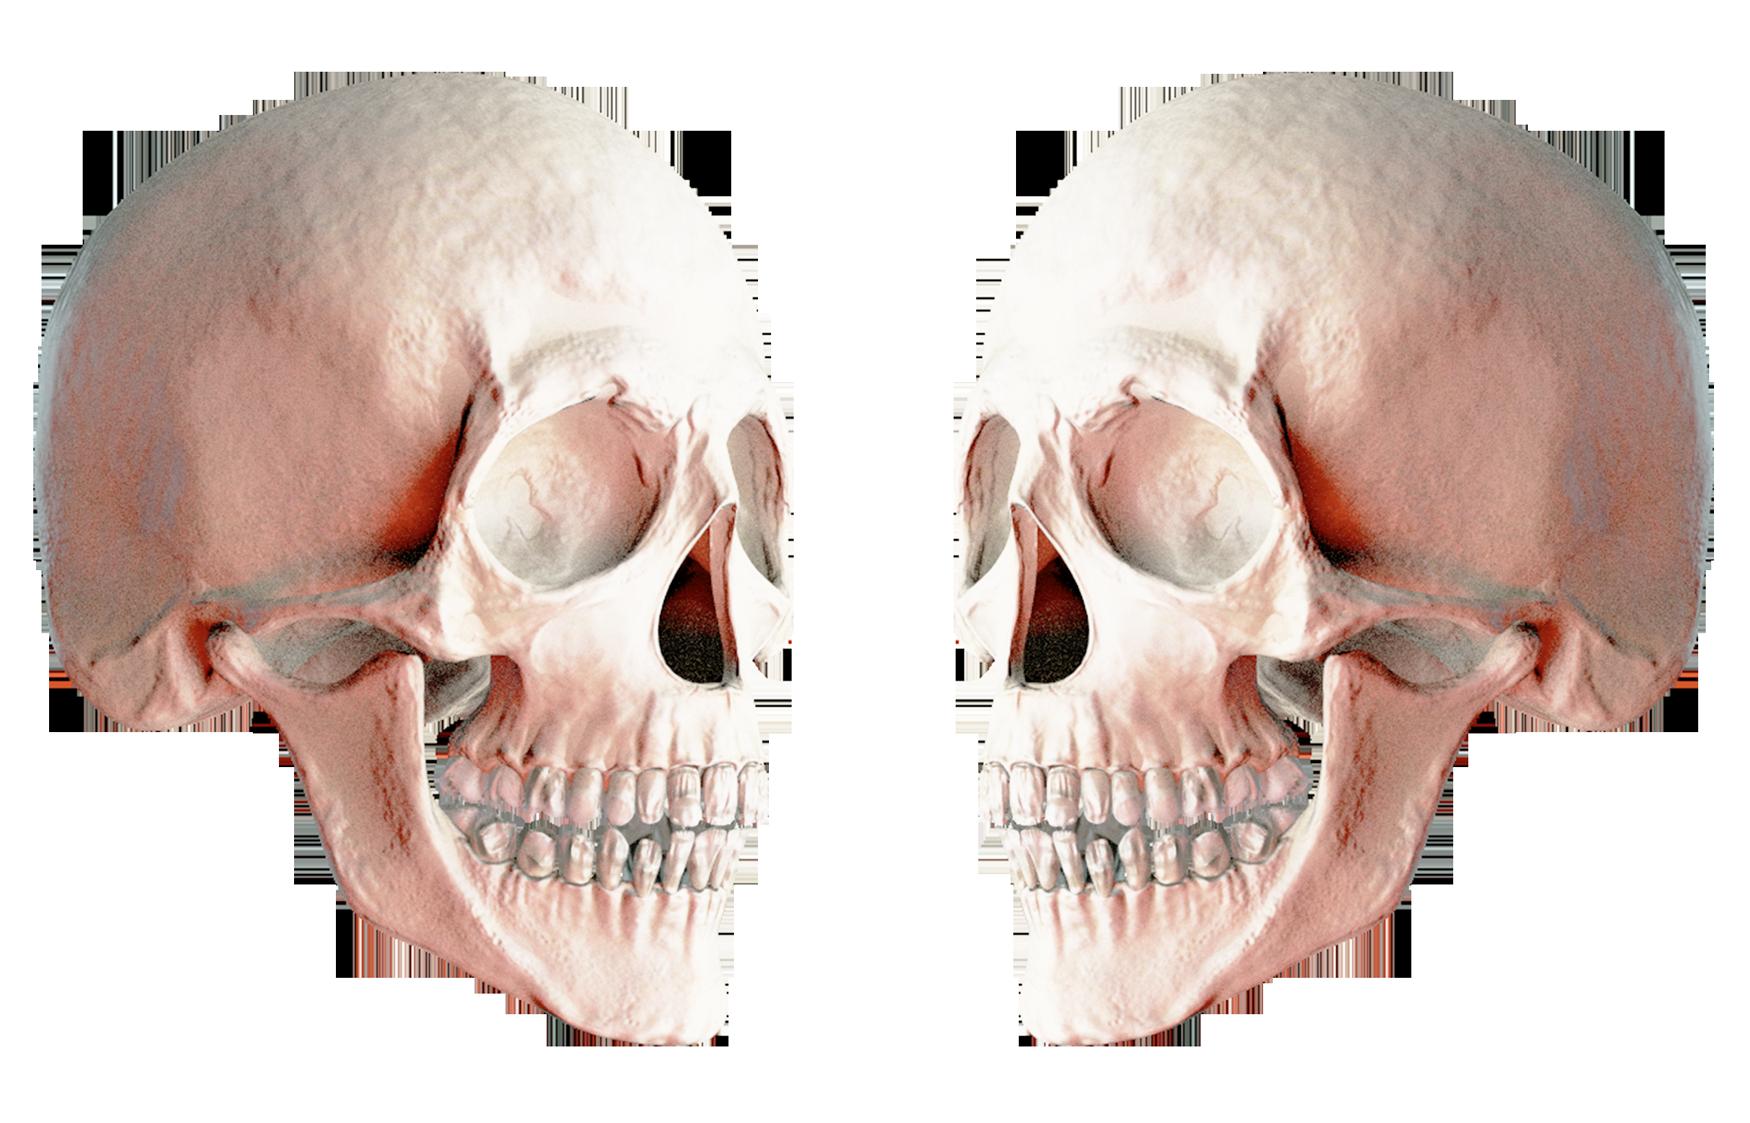 Skull Png Image Skull Human Skull Png Images